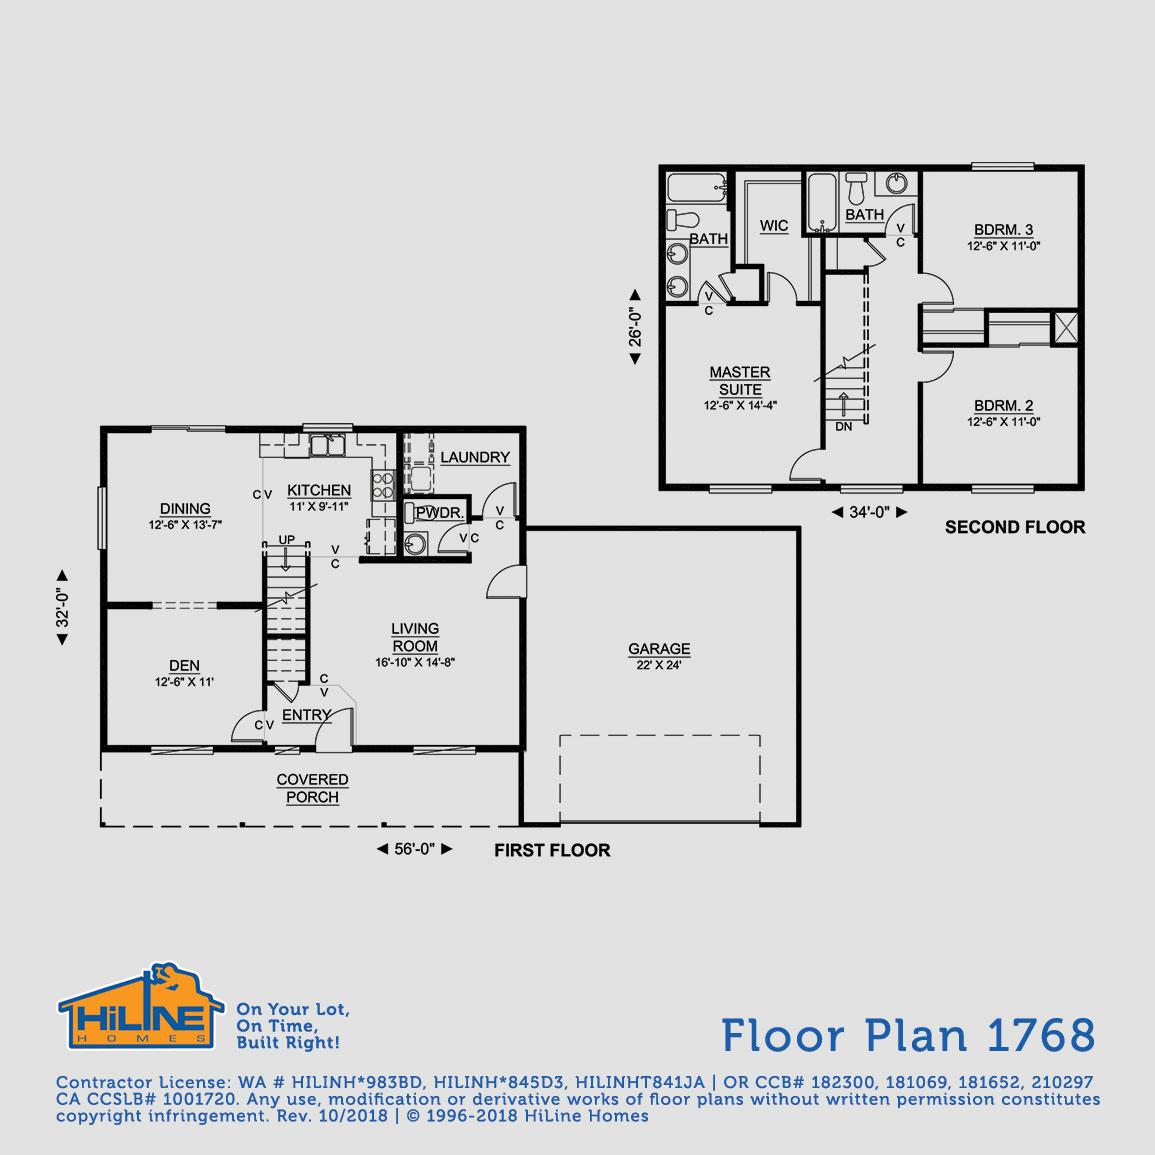 Floorplan 1768